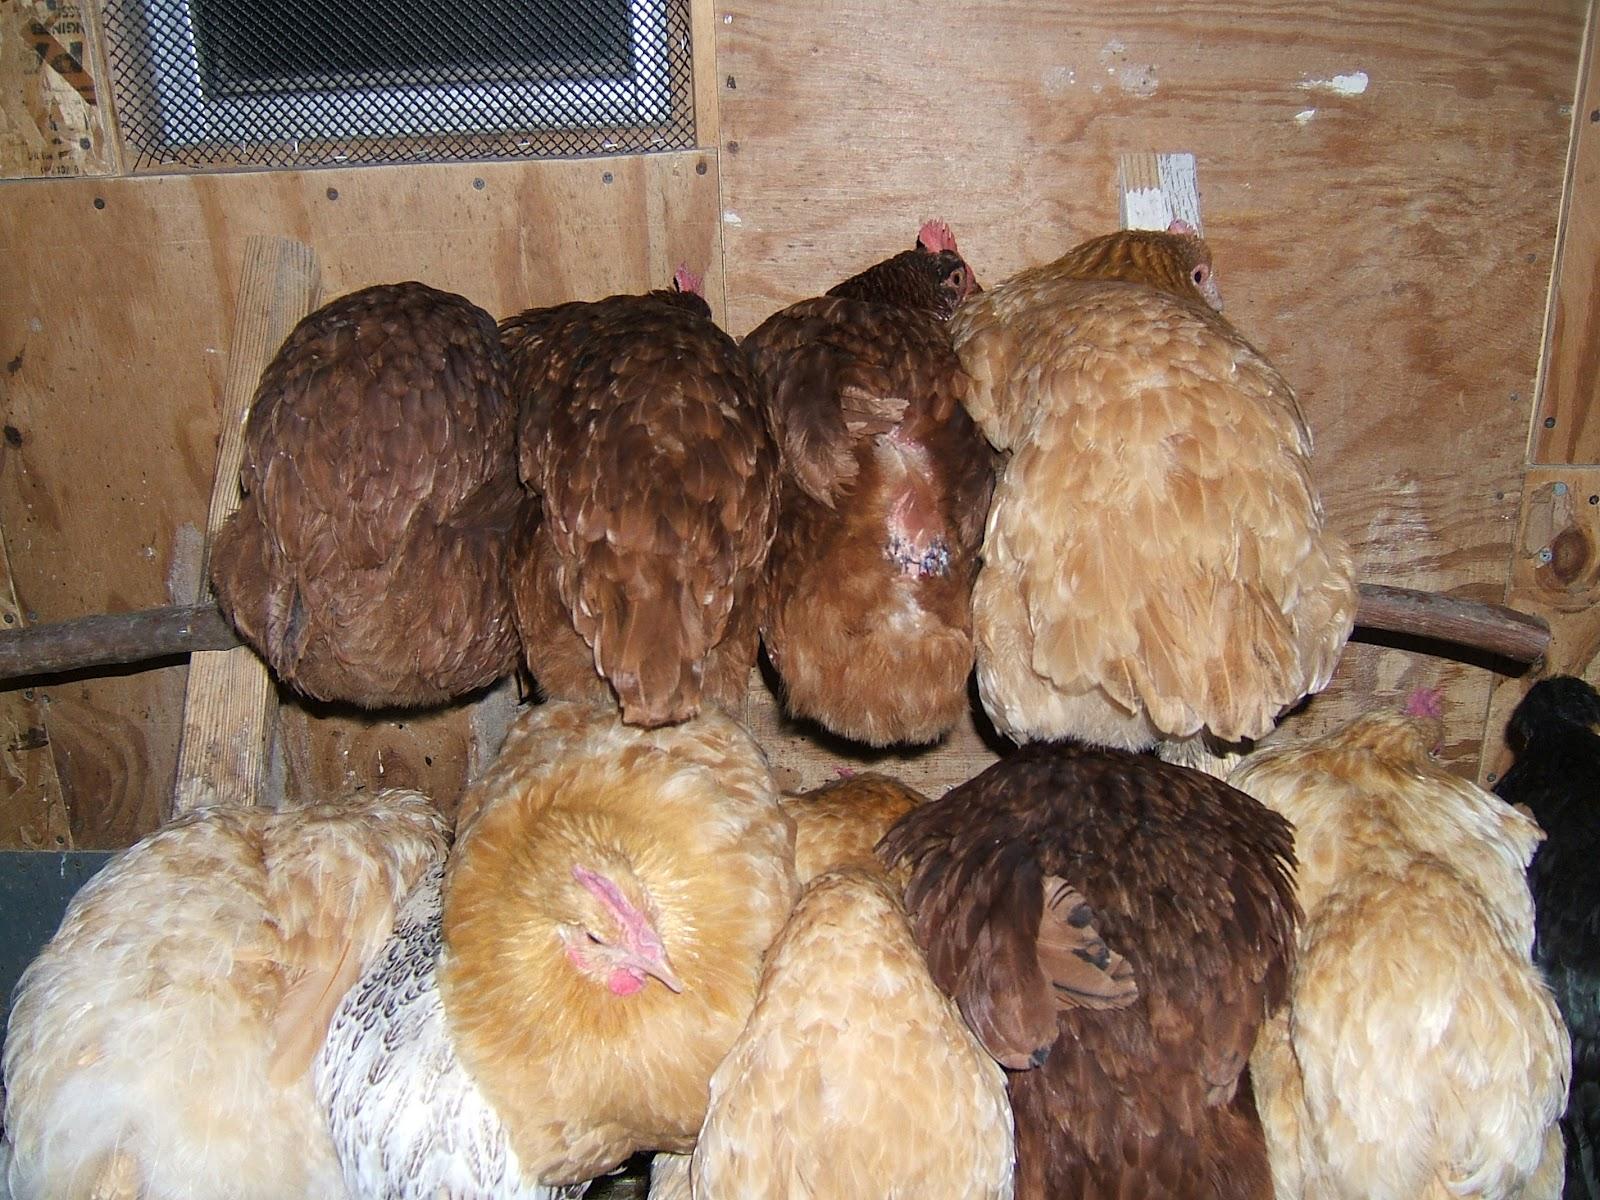 preparing for winter community chickens